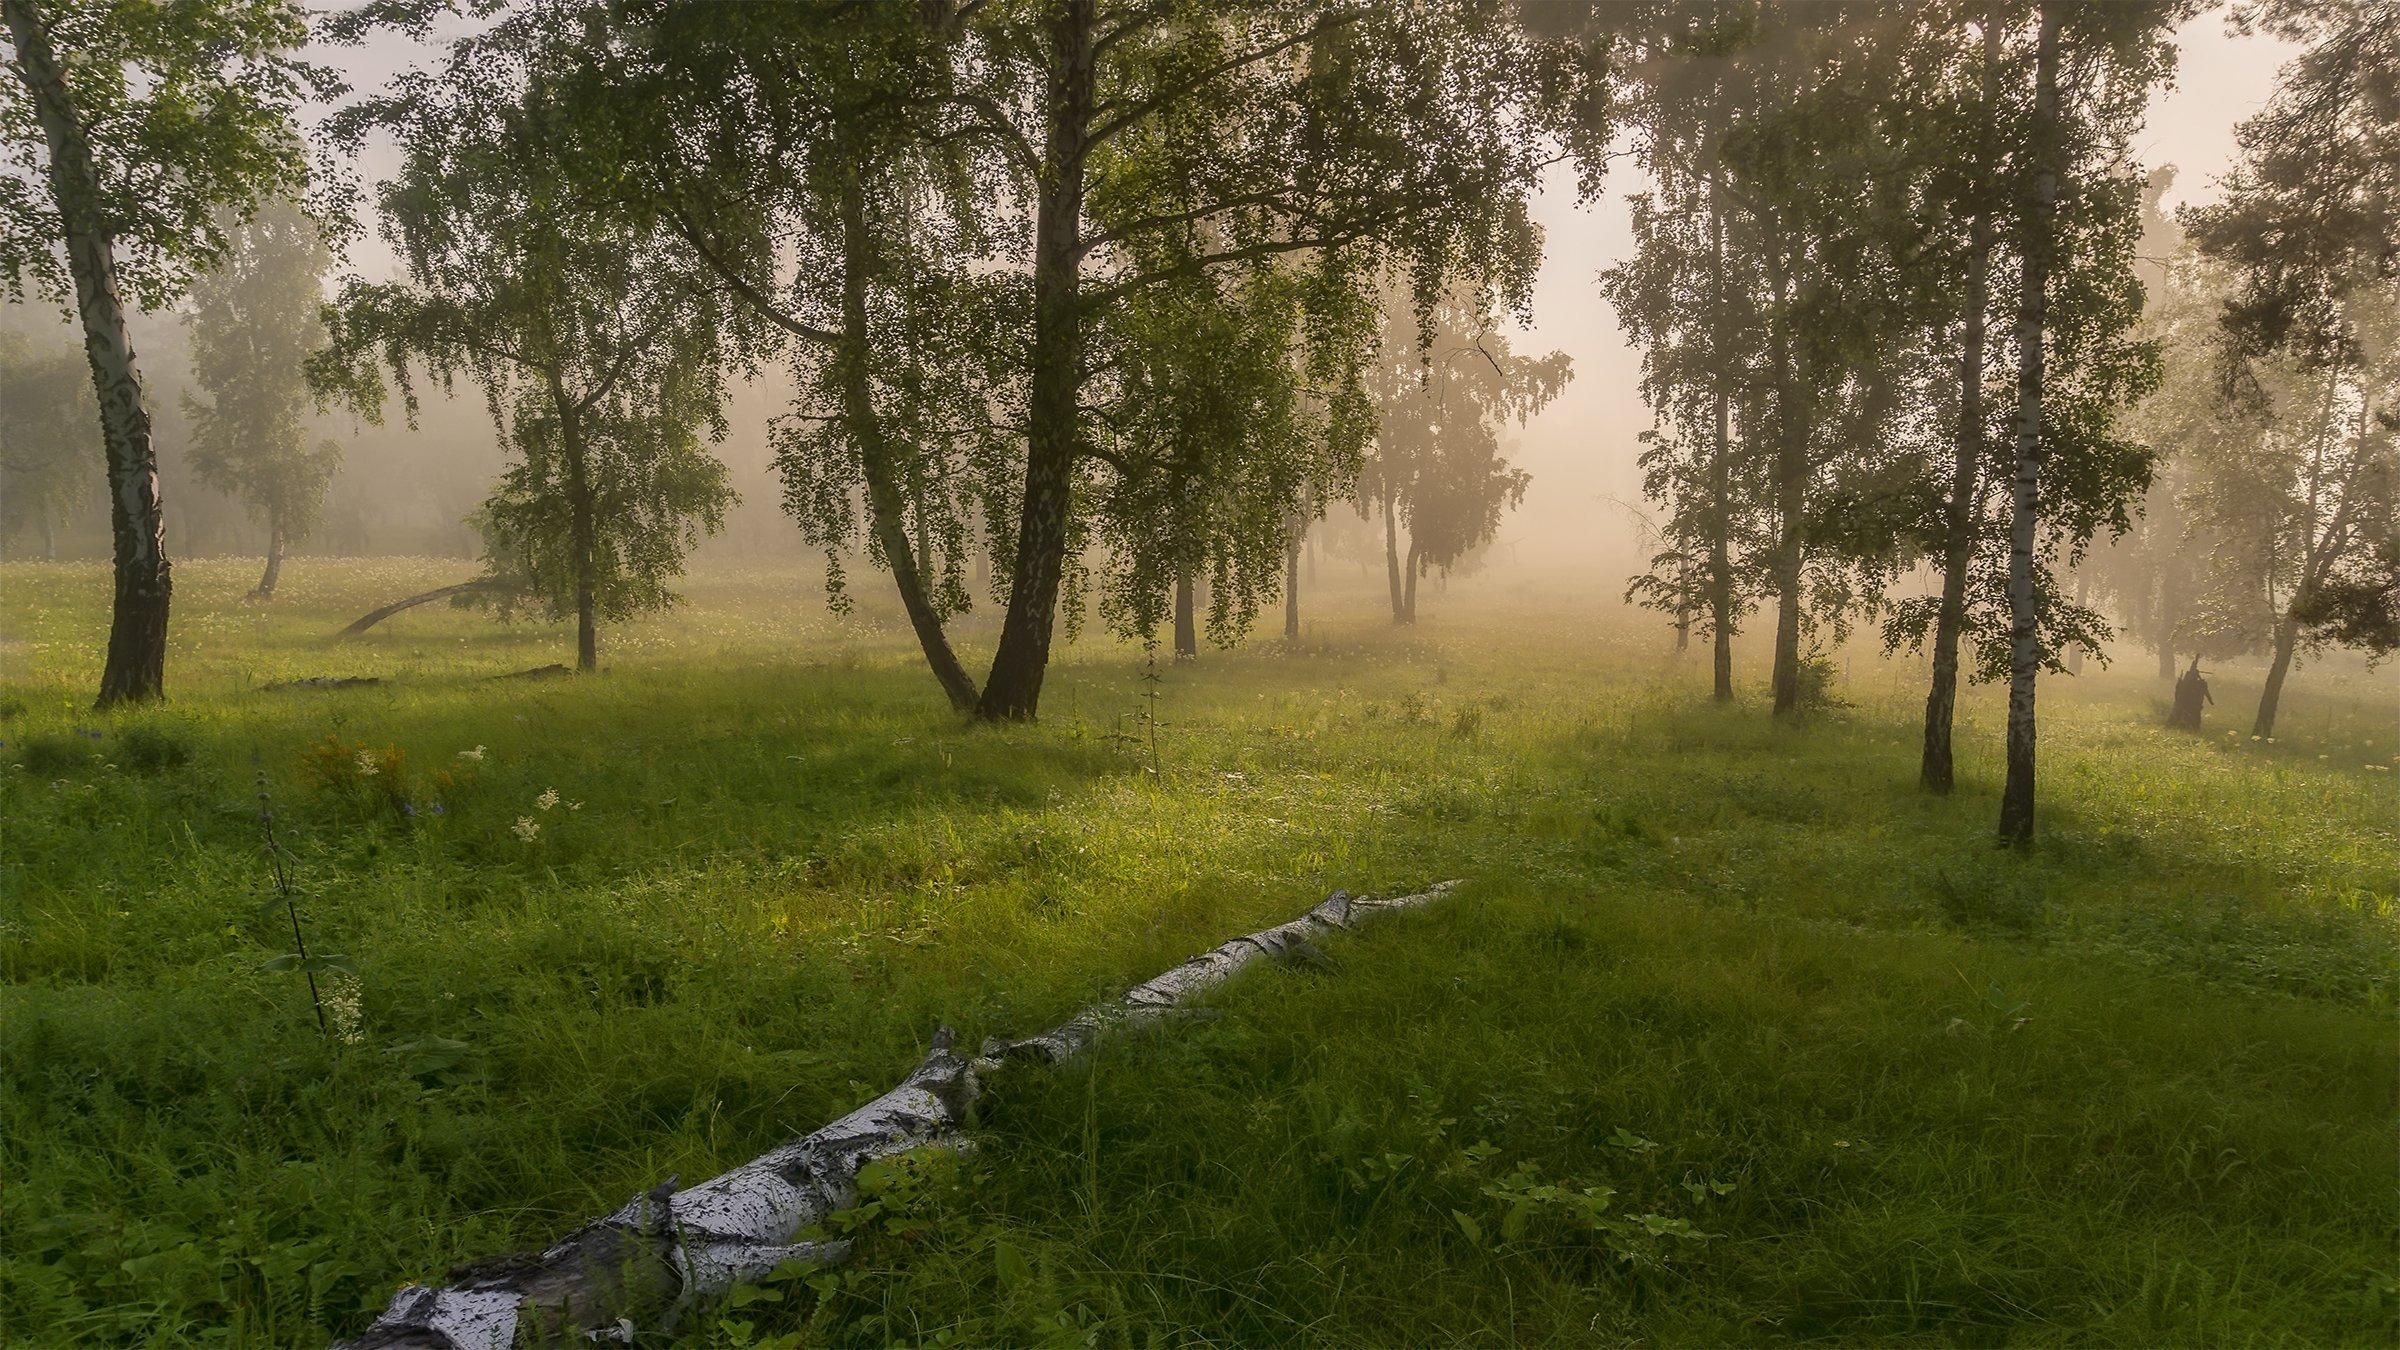 утро, рассвет, восход, туман, лучи, Леонид